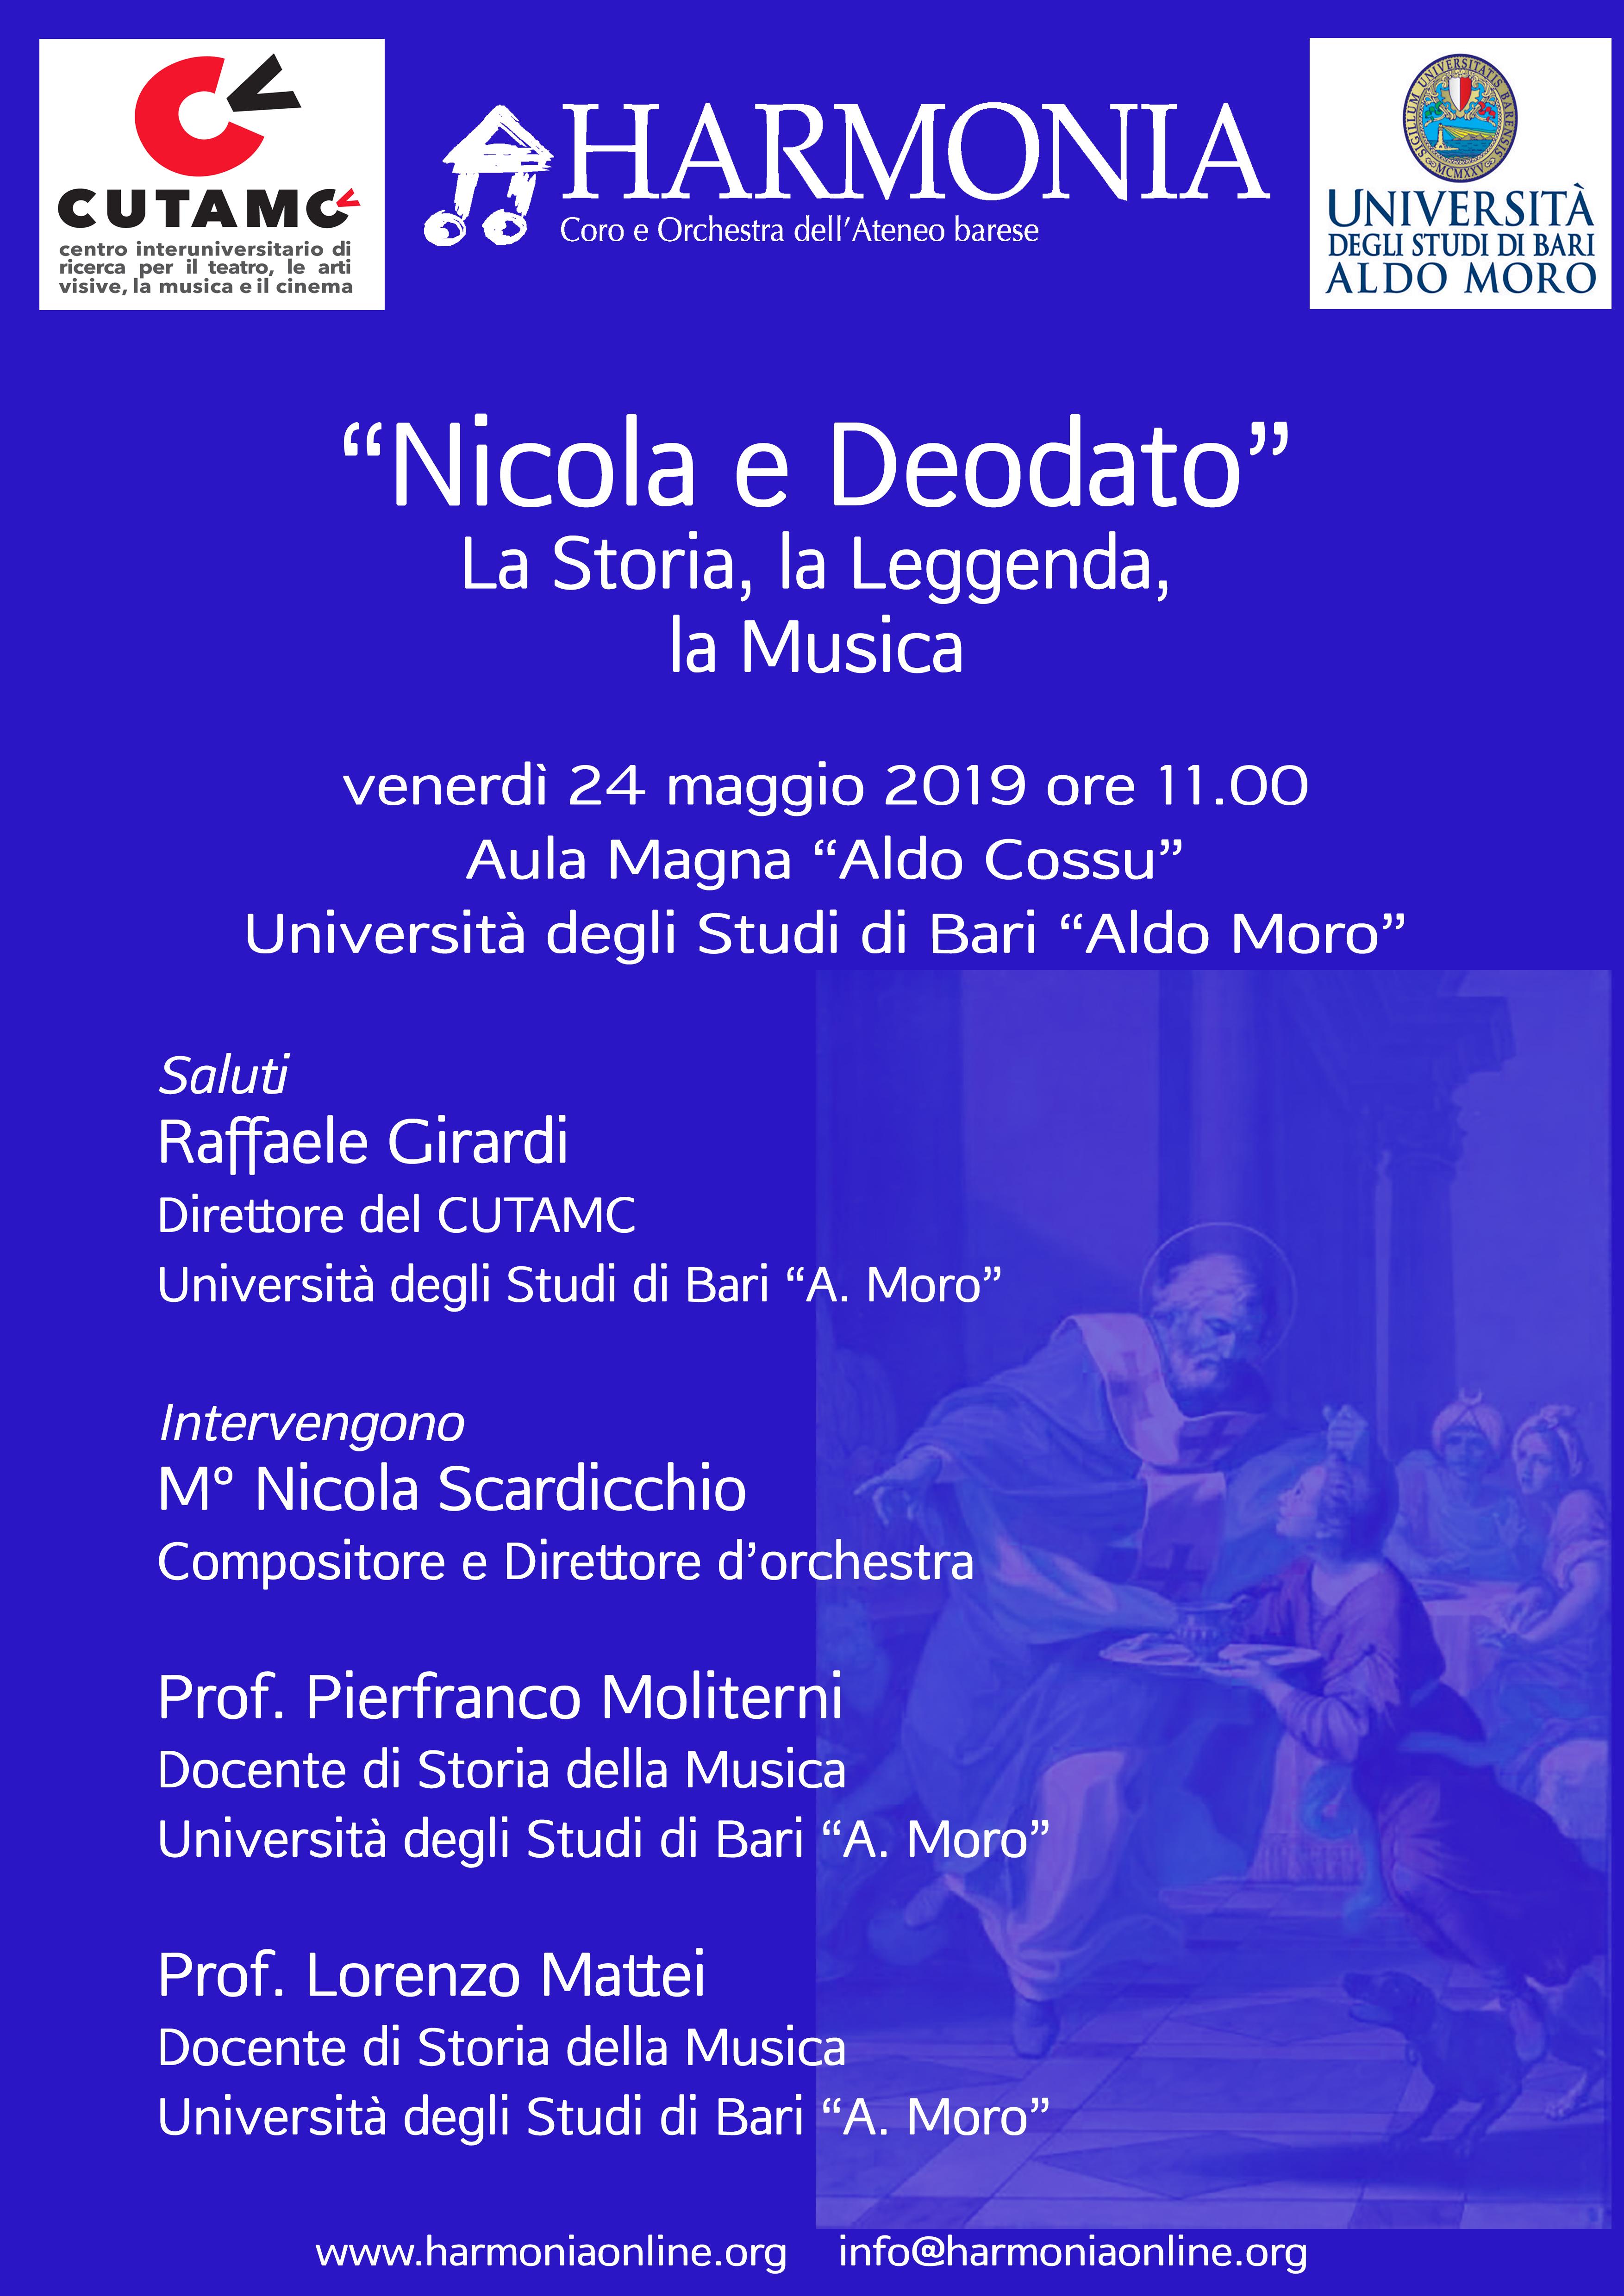 Nicola e Deodato - La Storia, la Leggenda, la Musica @ Aula Magna